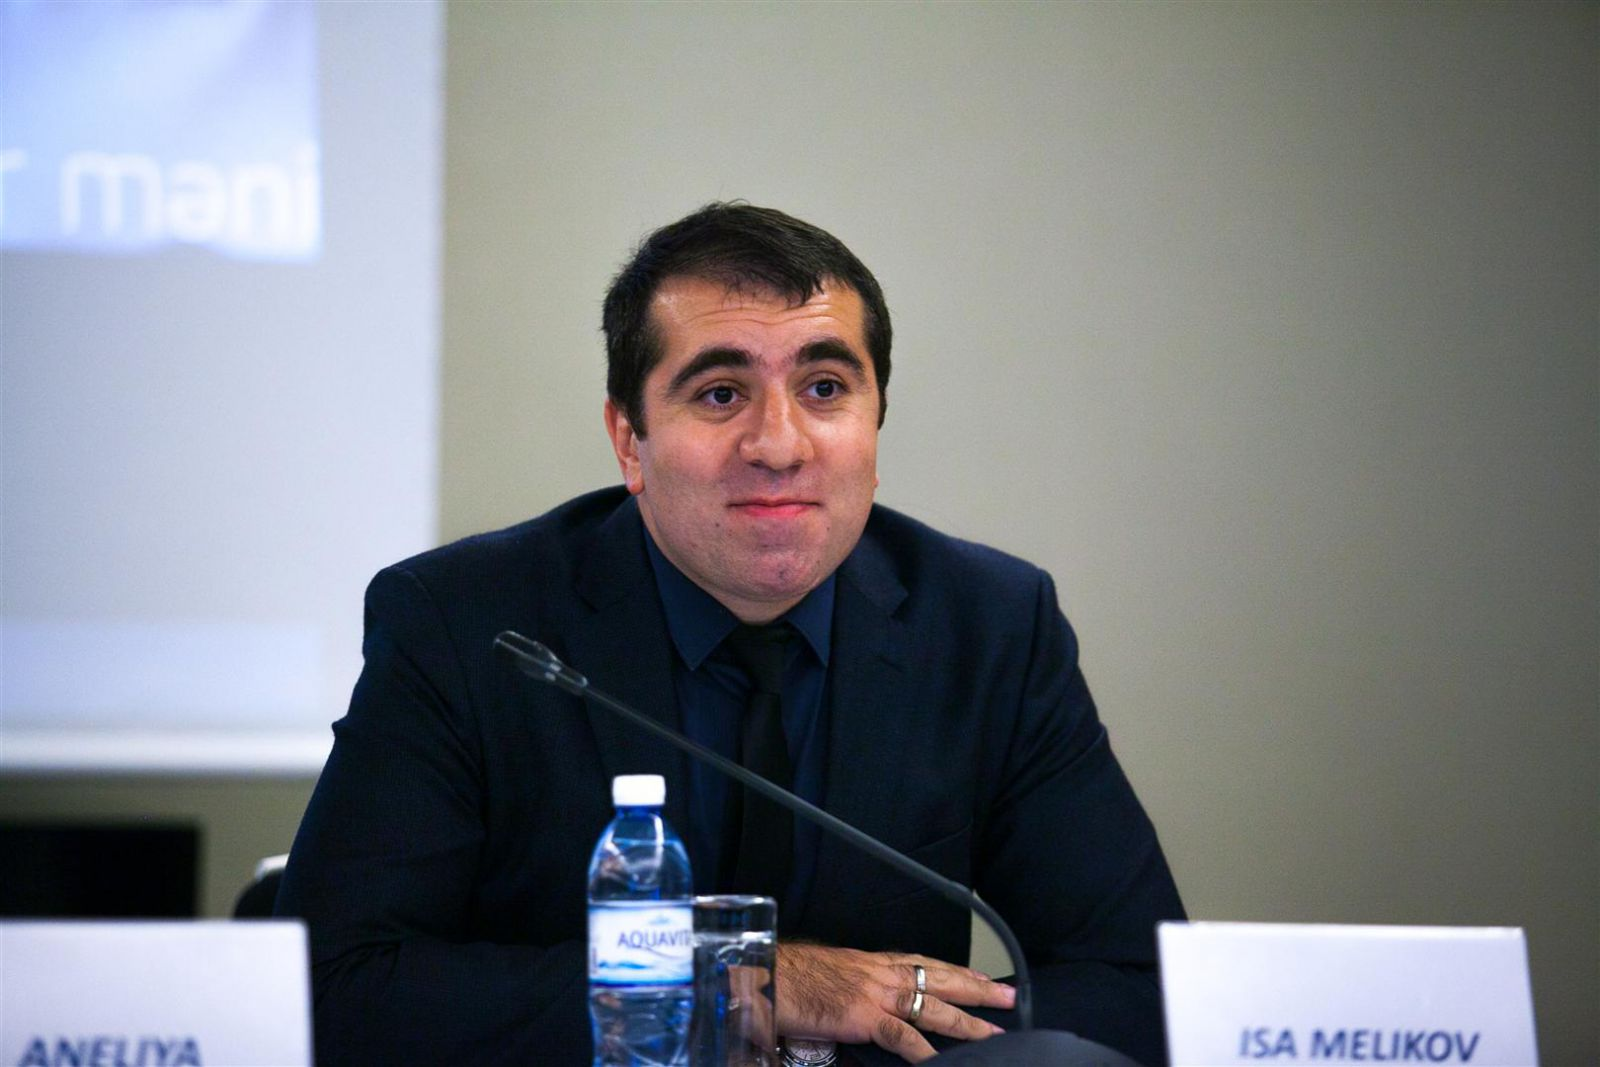 Isa Melikov